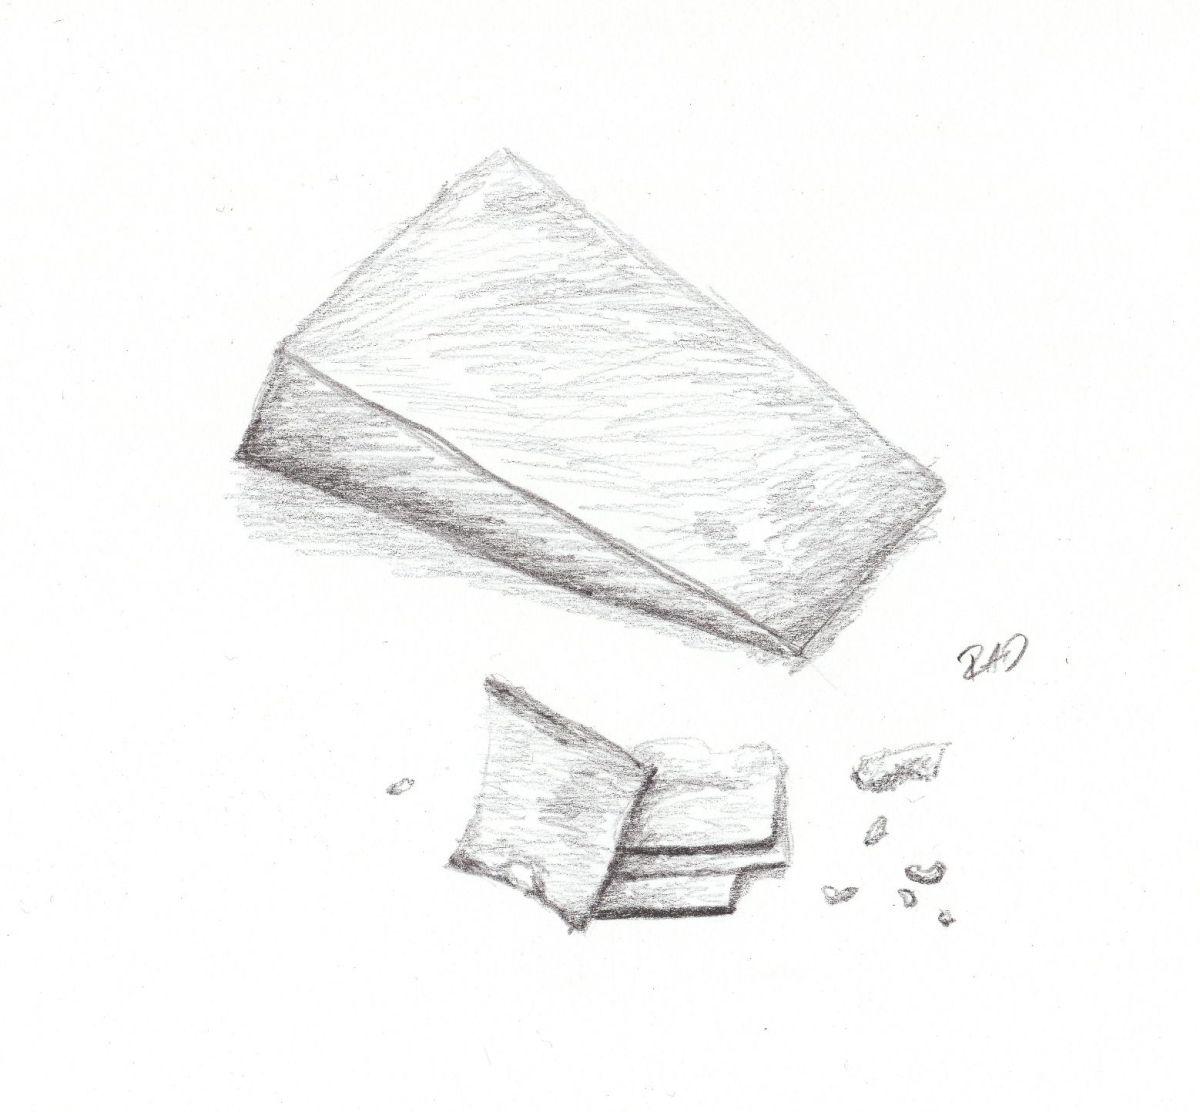 Cheese Block by Rachel Desilets